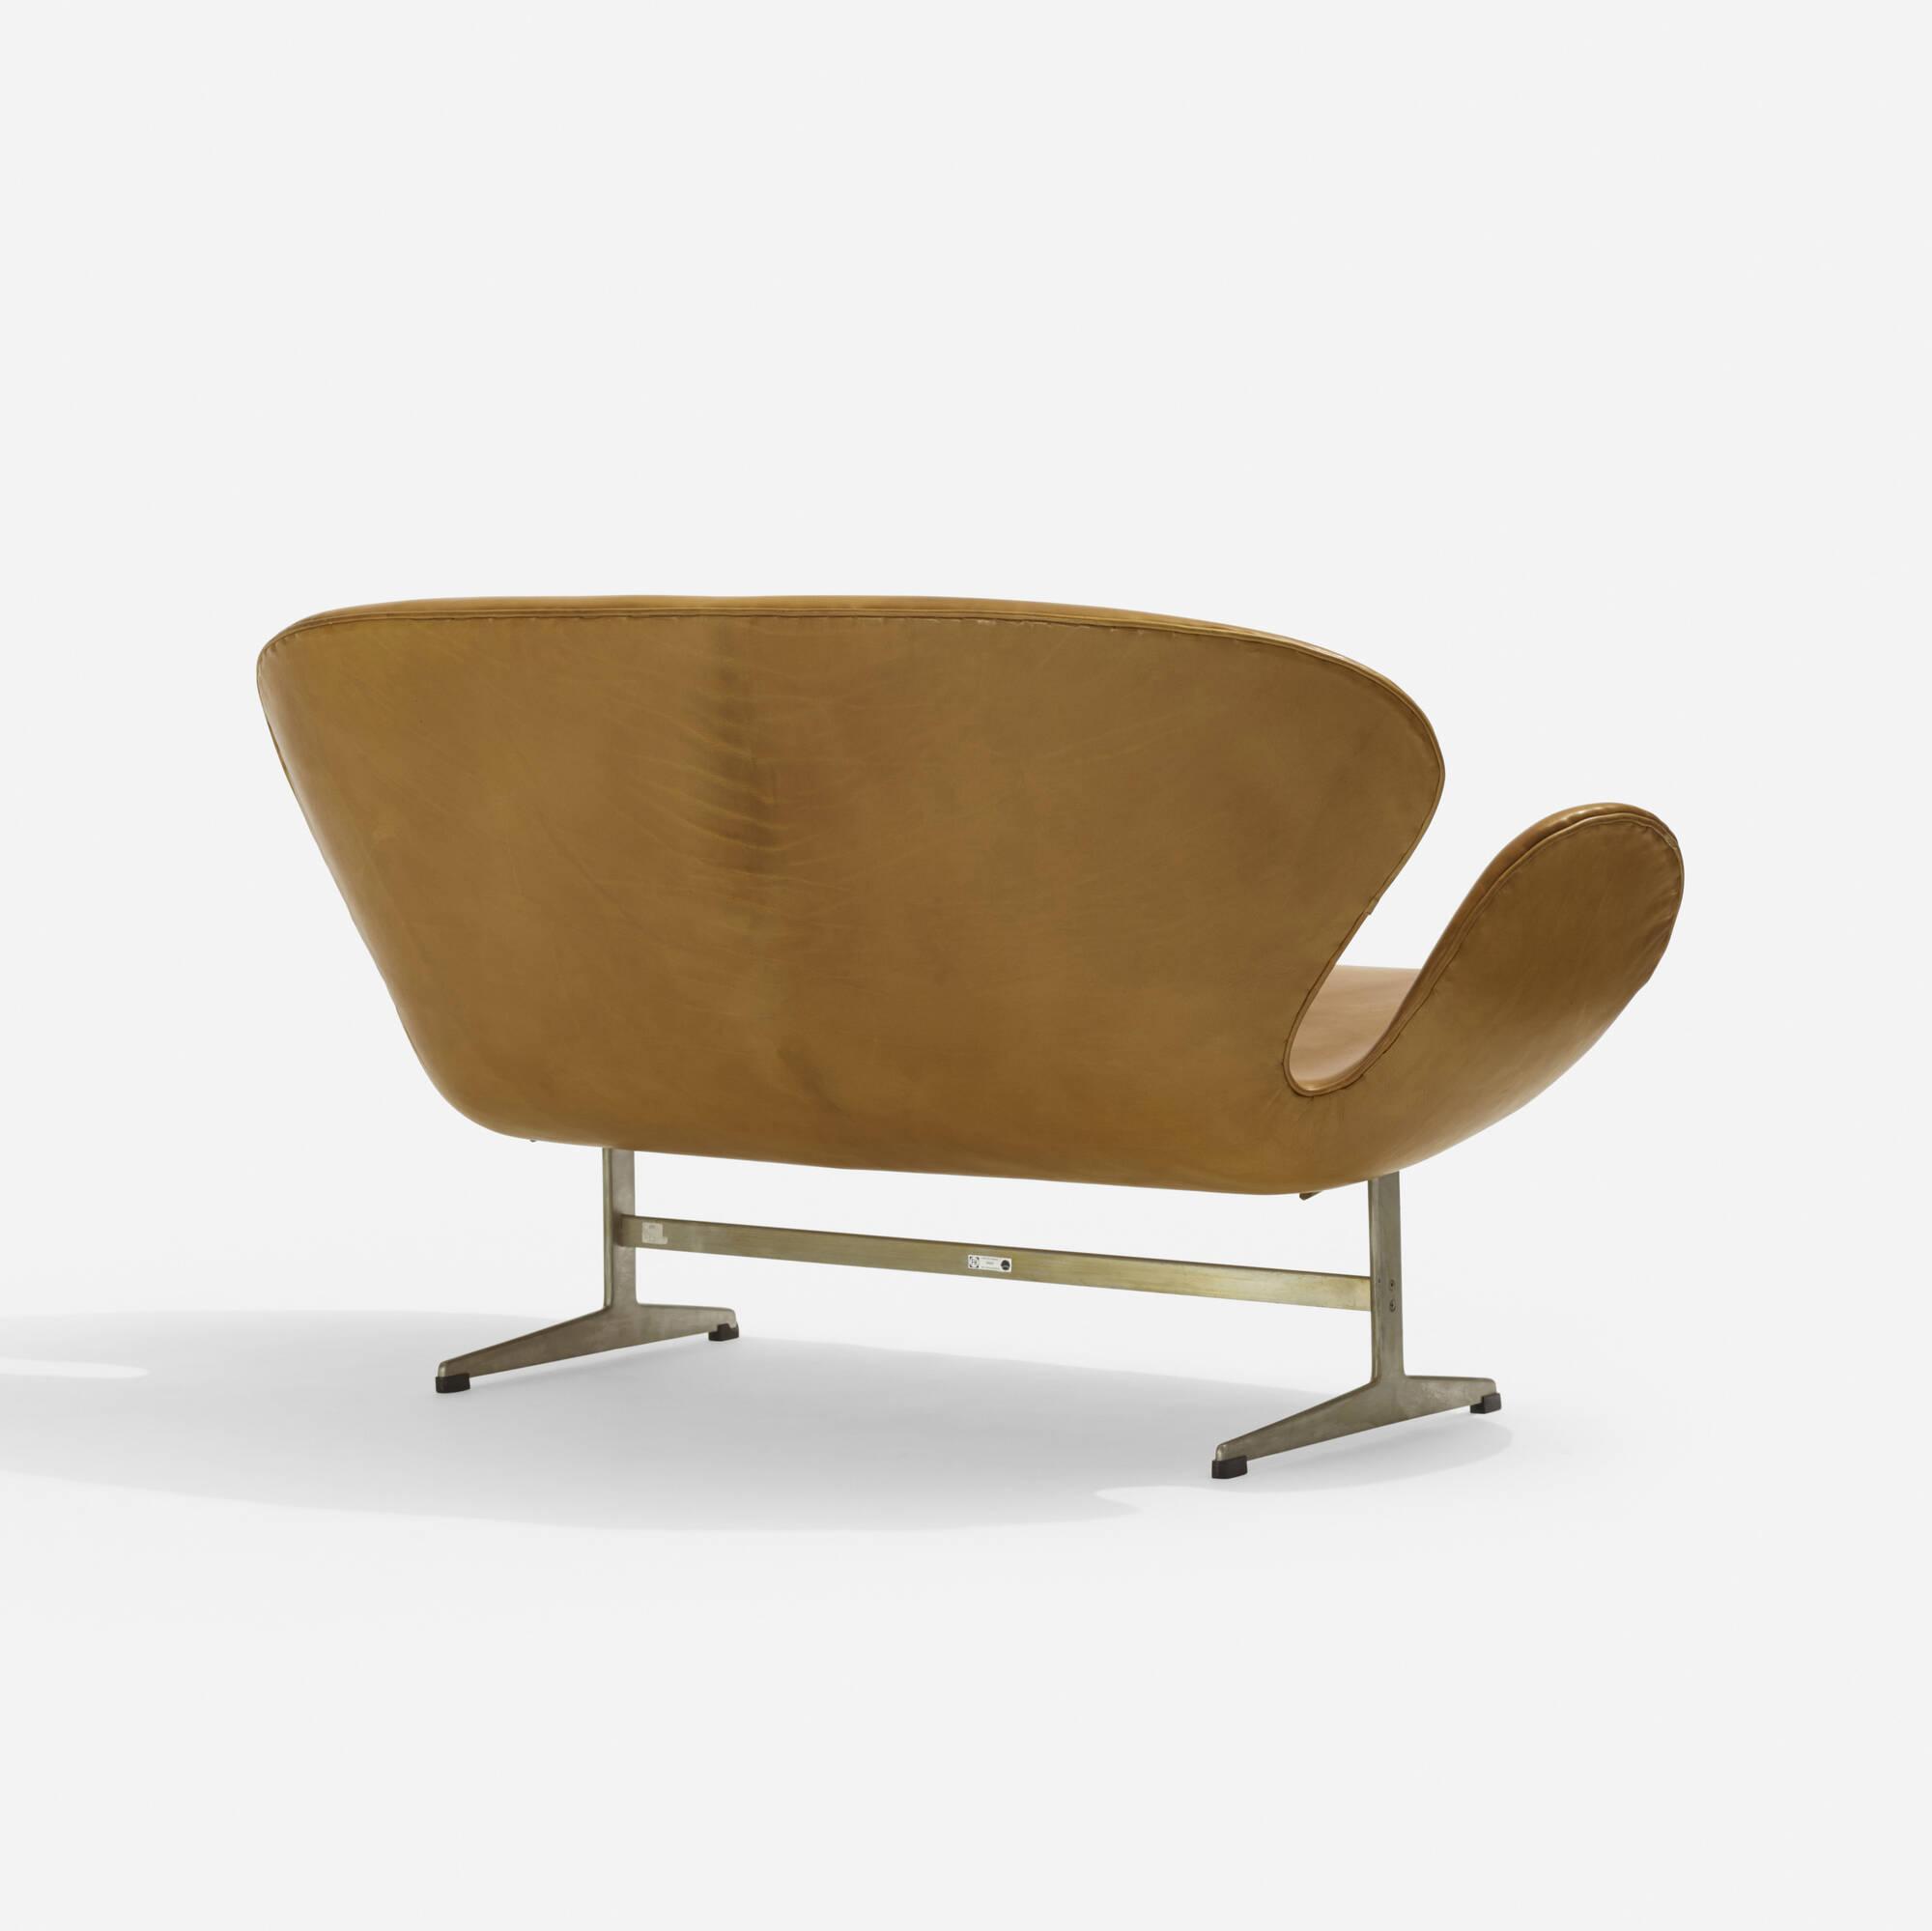 106: Arne Jacobsen / Swan settee, model 3321 (3 of 5)